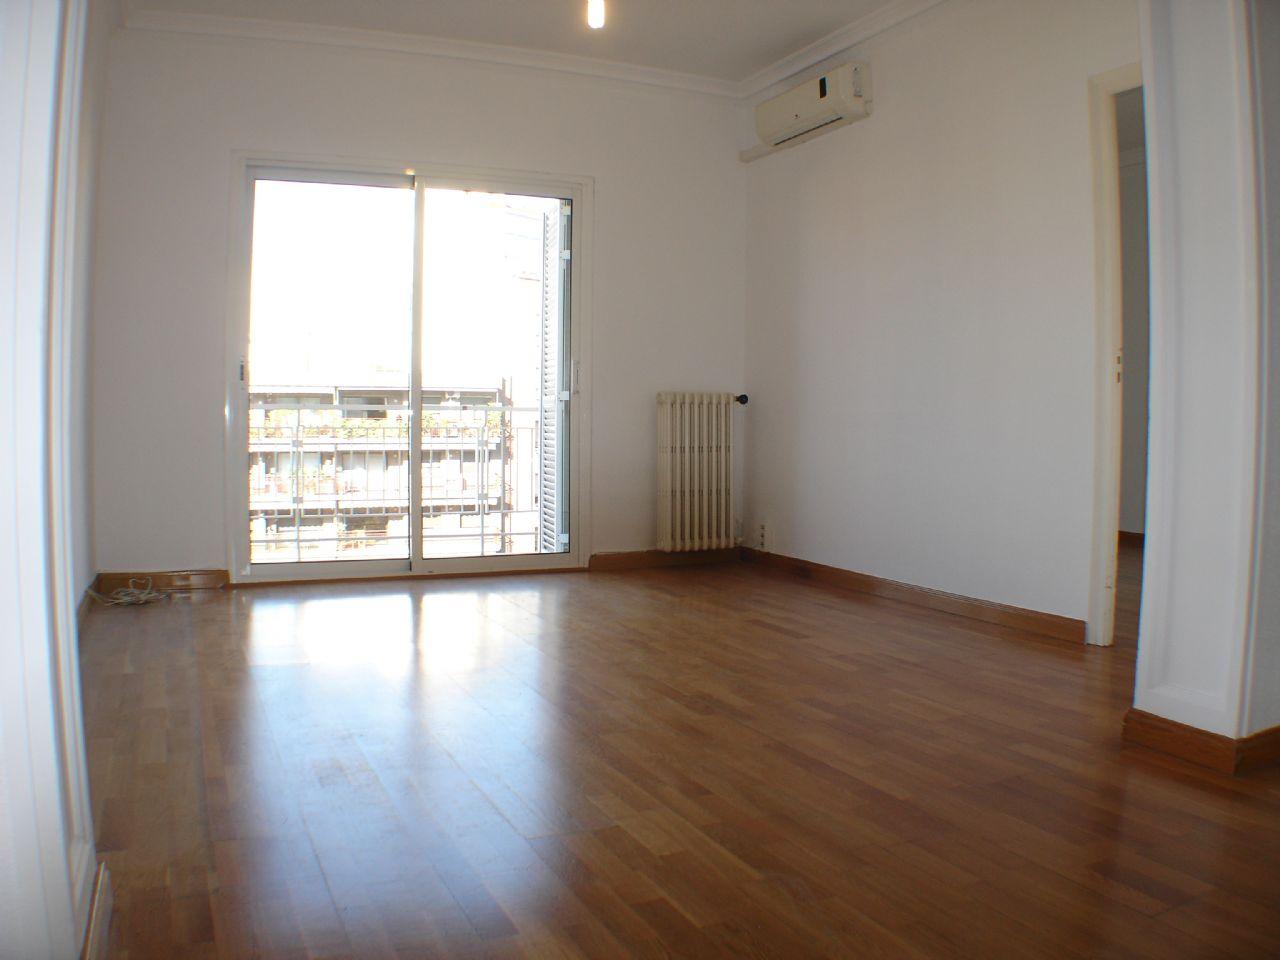 Flat in Barcelona, Nova Esquerra Eixample, for sale